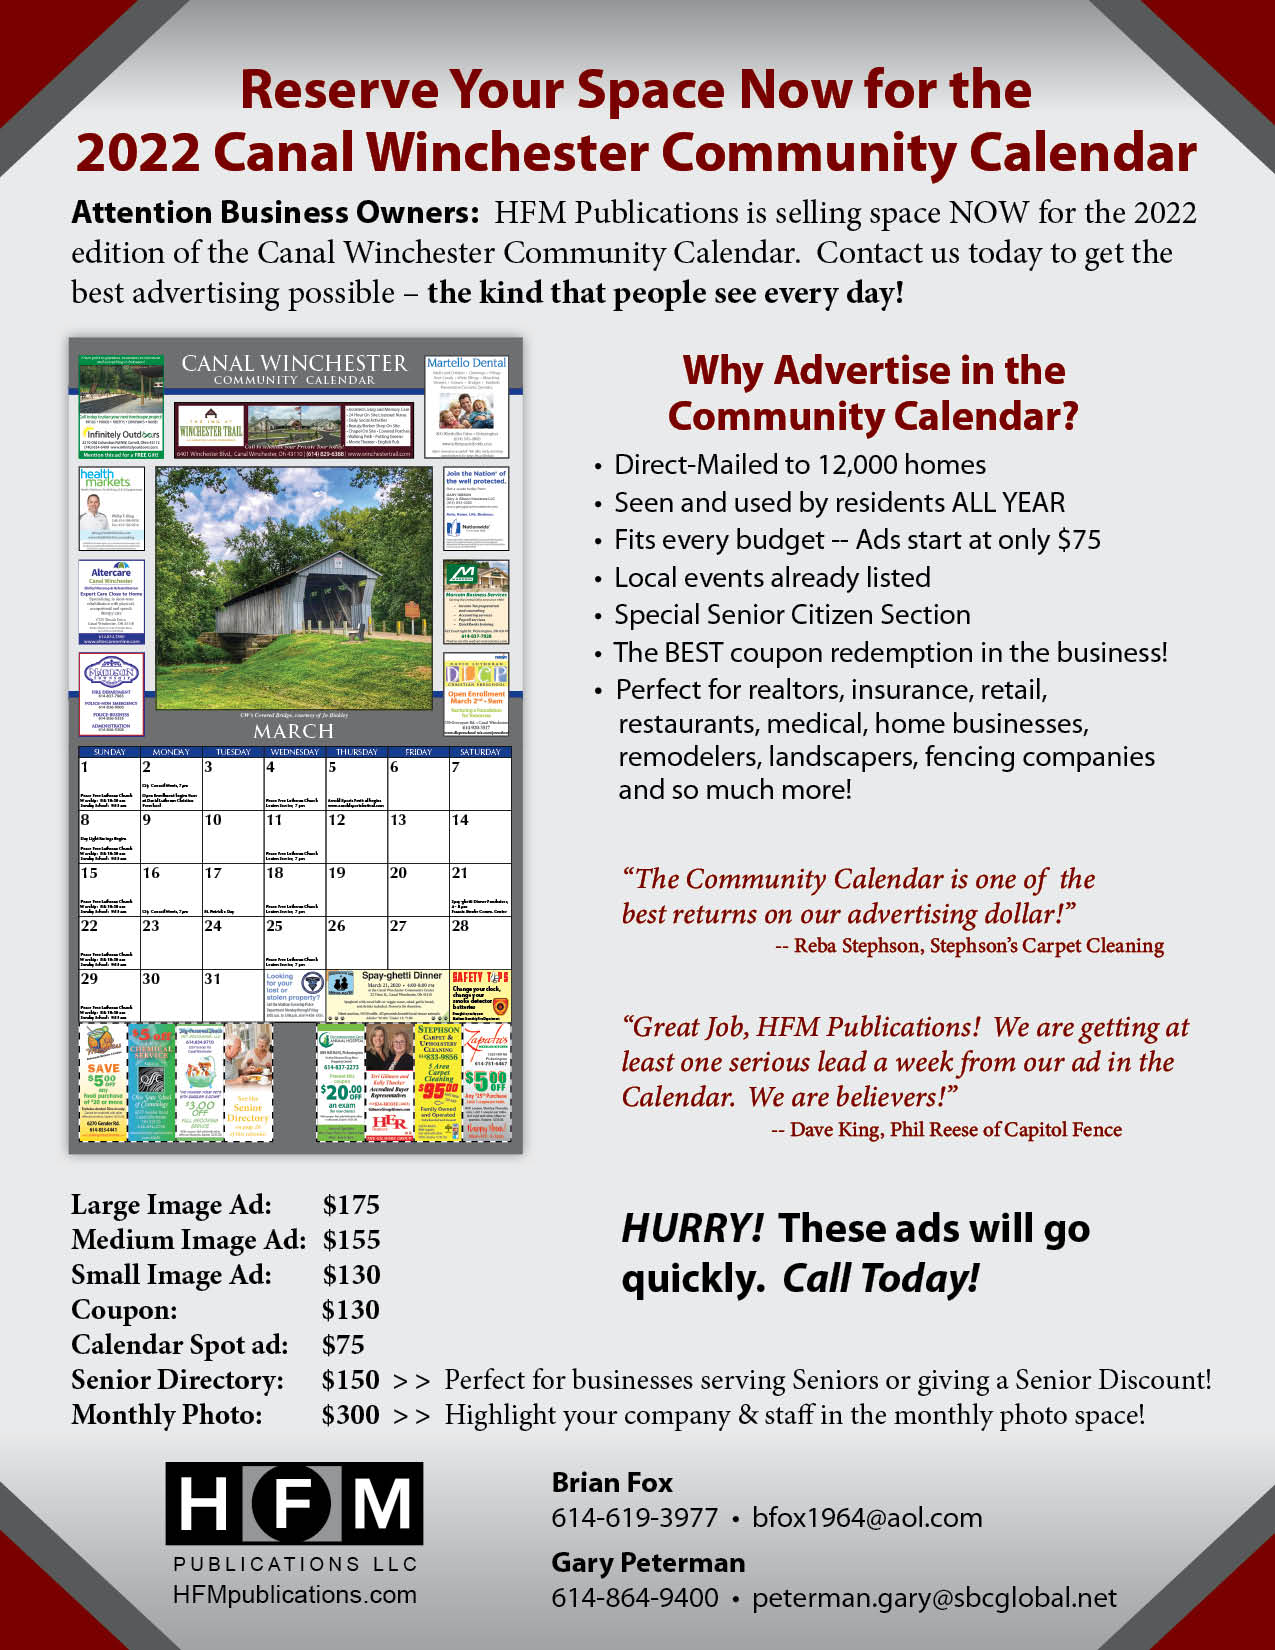 Pickerington Community Calendar status